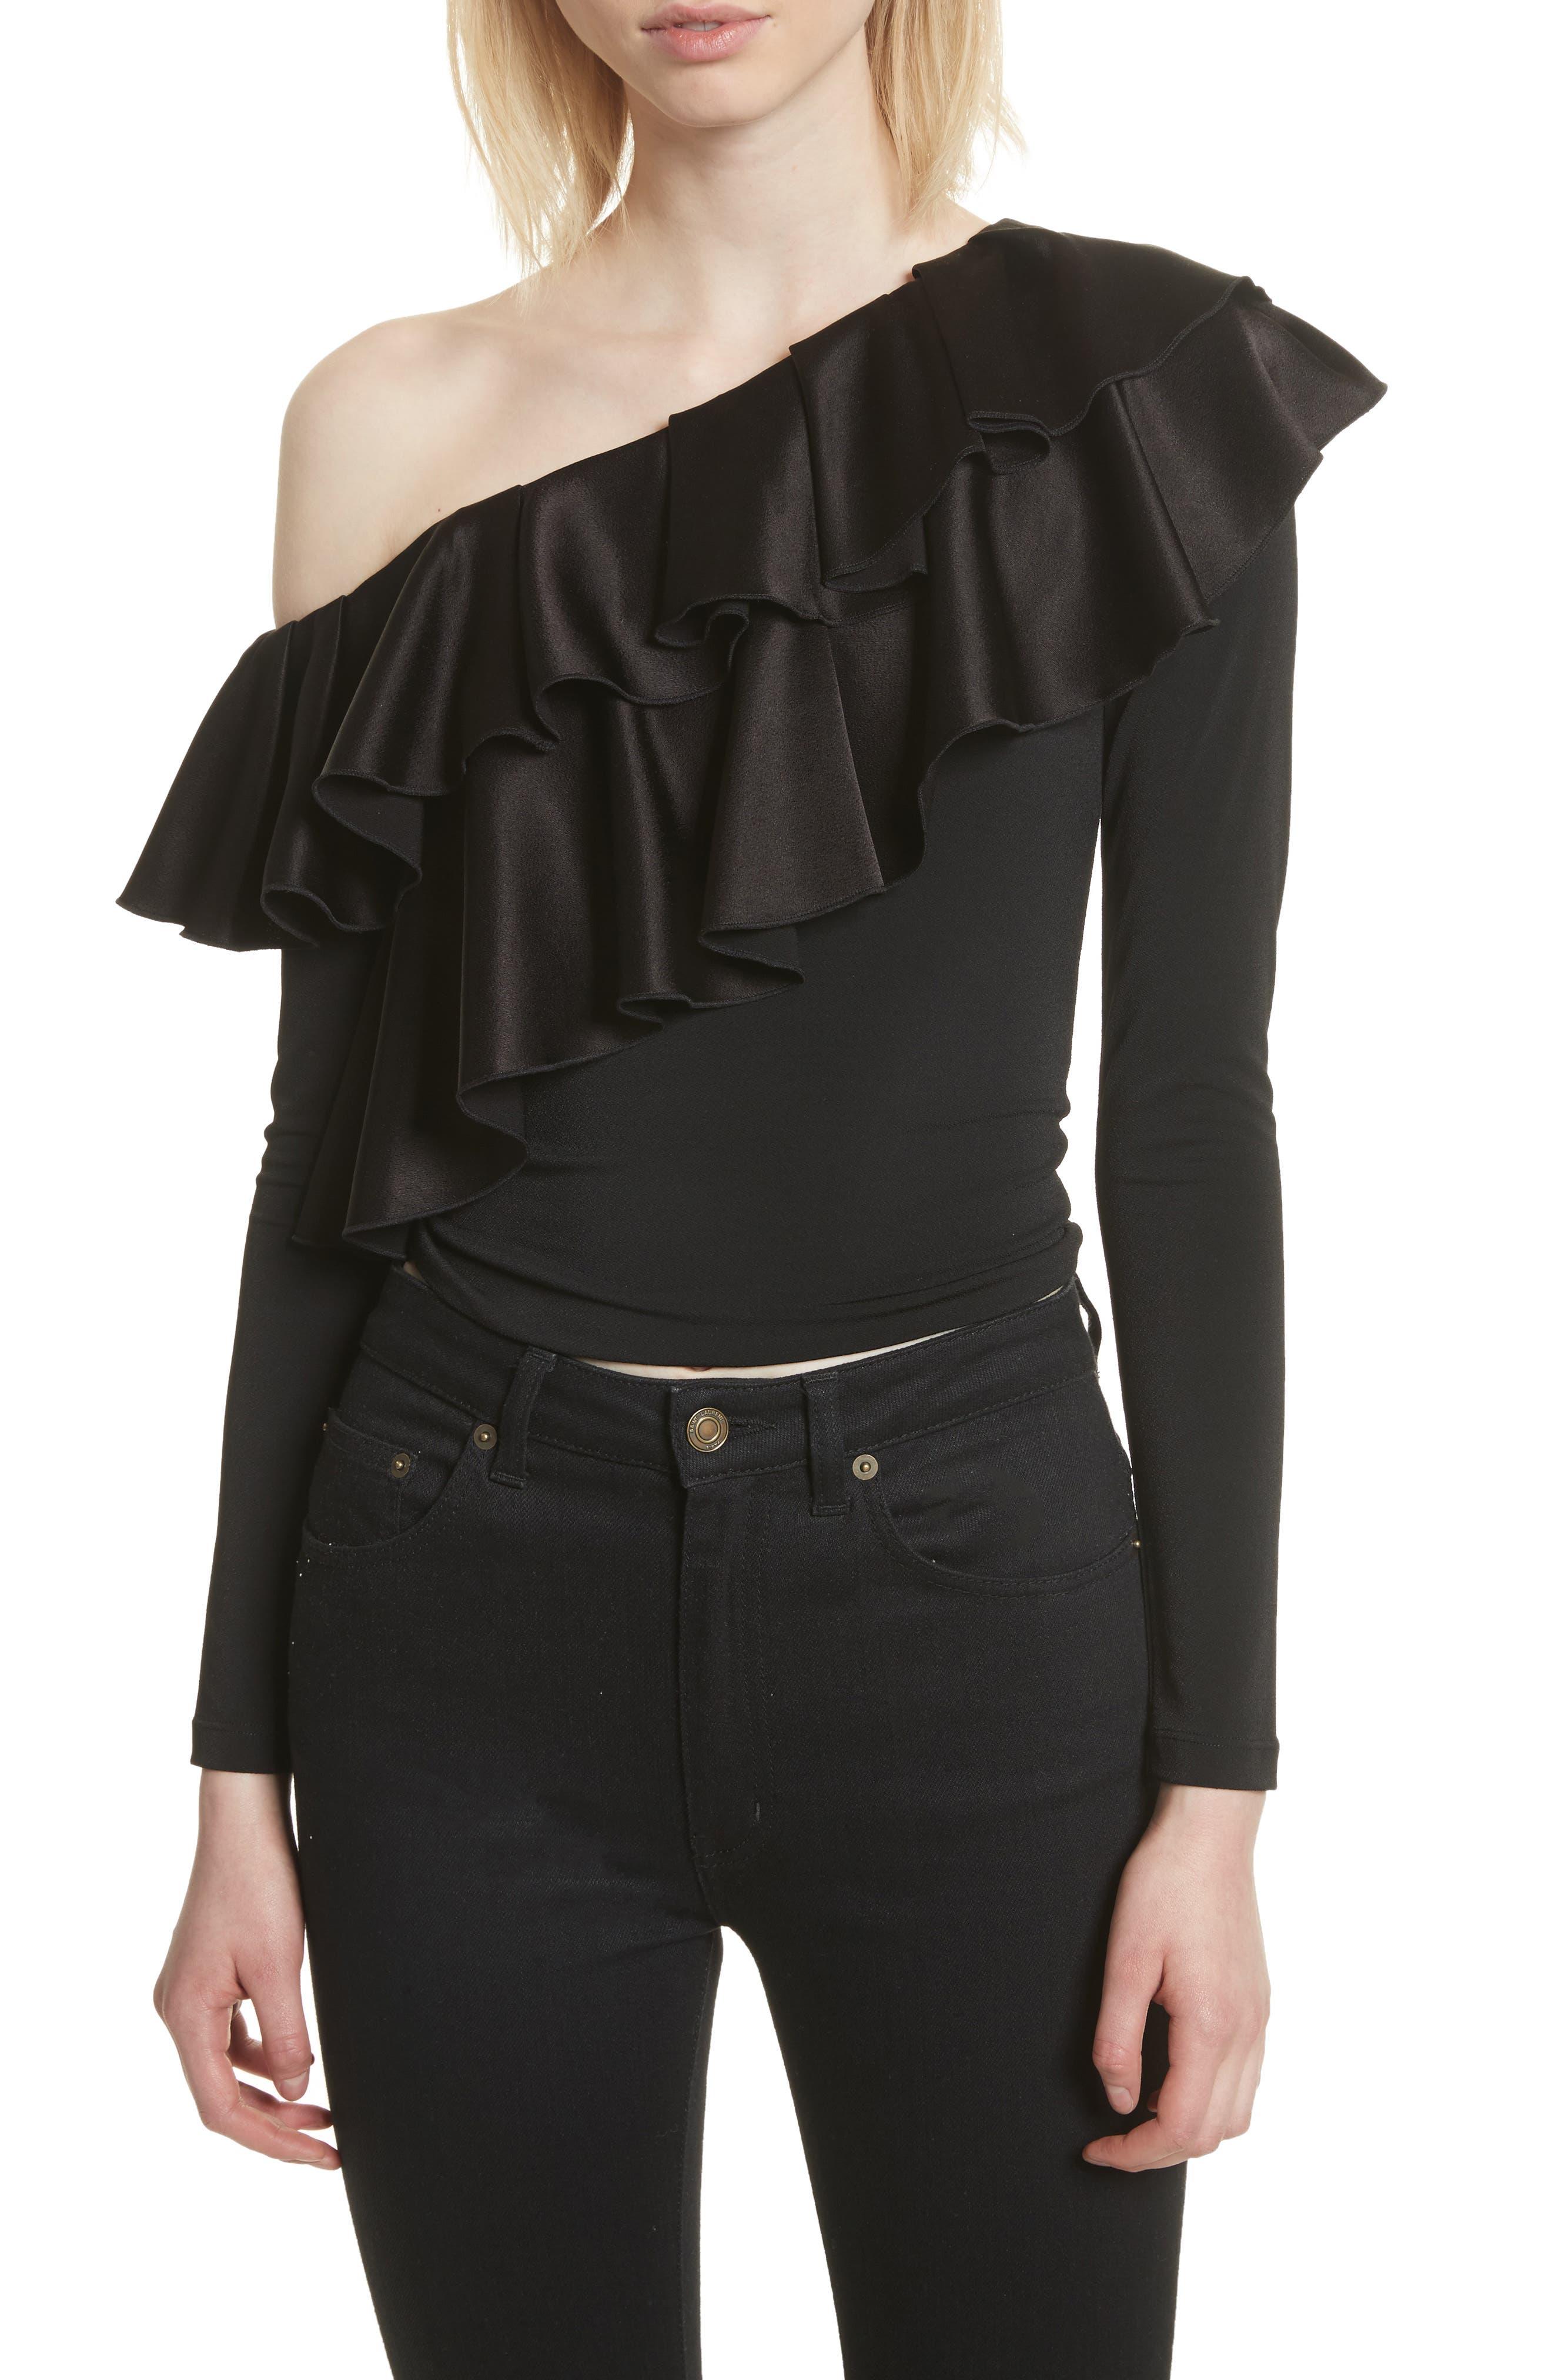 Alternate Image 1 Selected - Alice + Olivia Izzy One-Shoulder Ruffle Crop Top